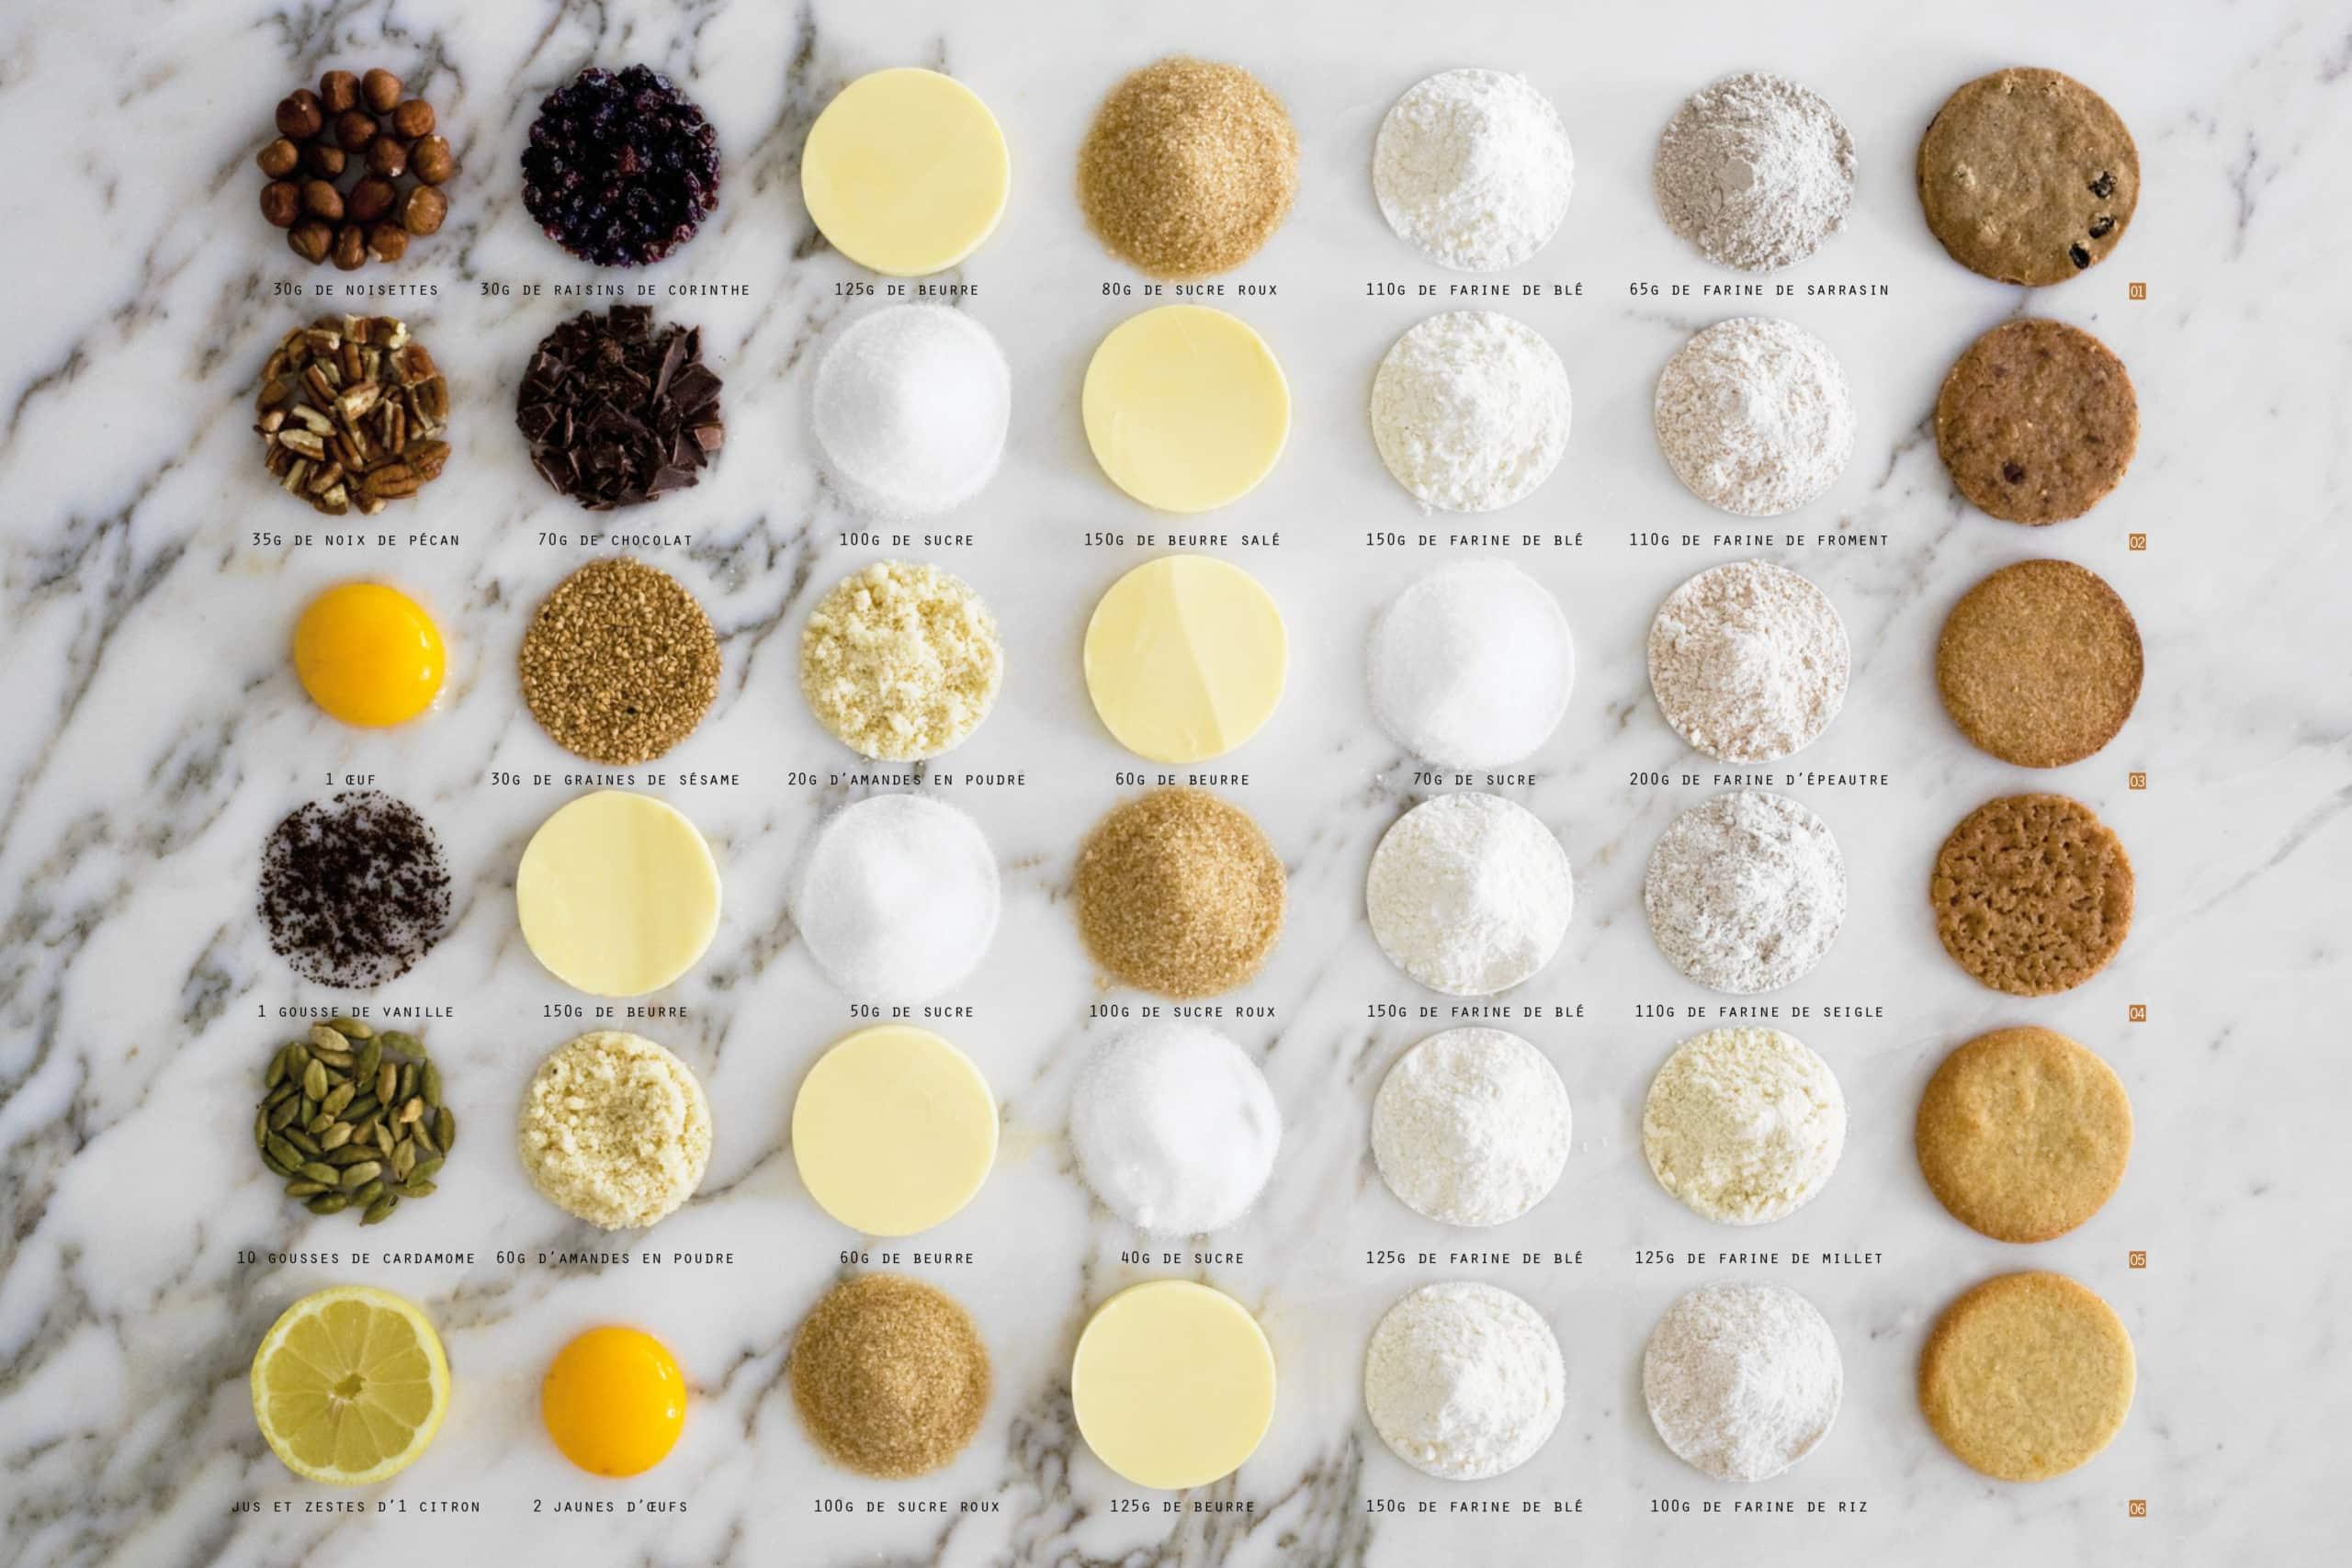 biscuits recette